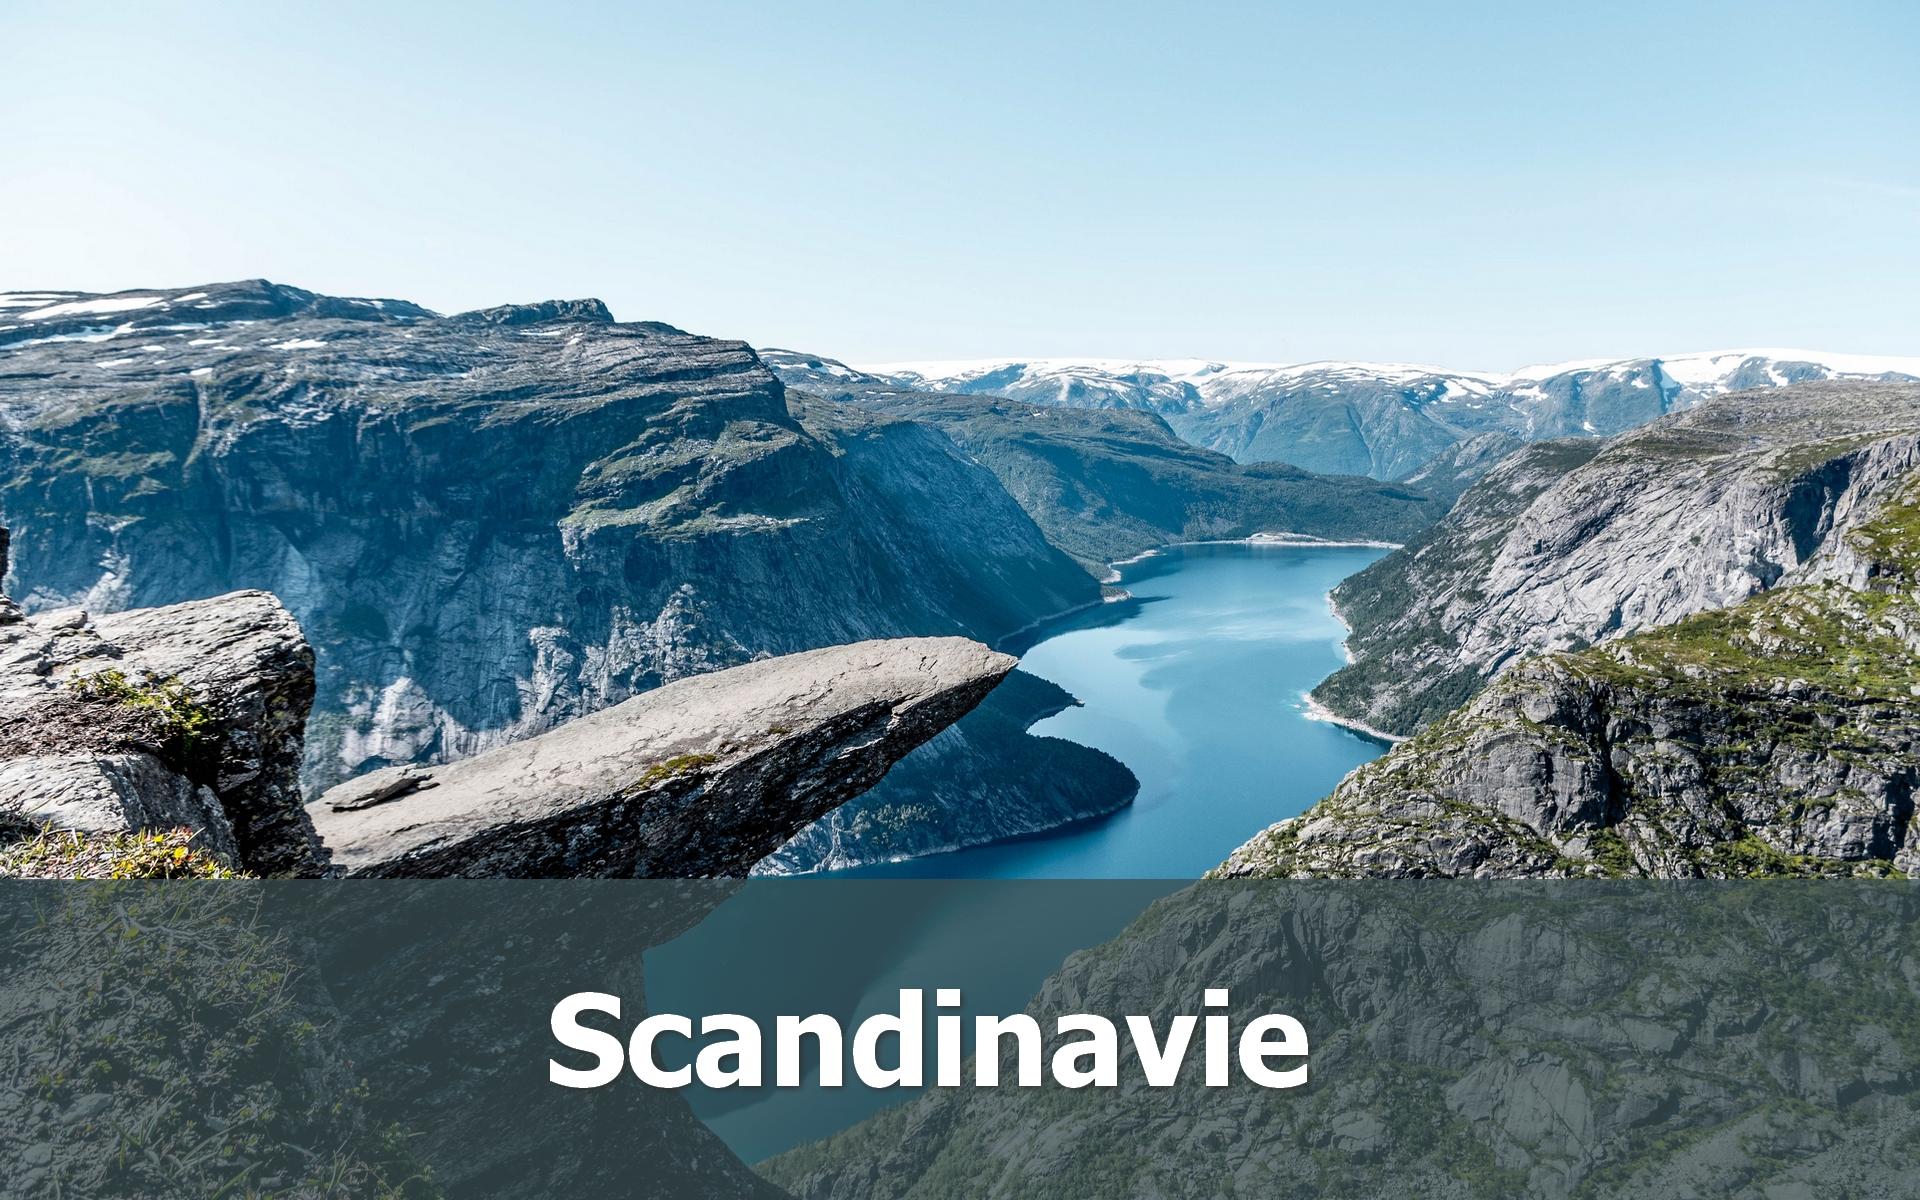 Voyage en Scandinavie sur-mesure Trolltunga